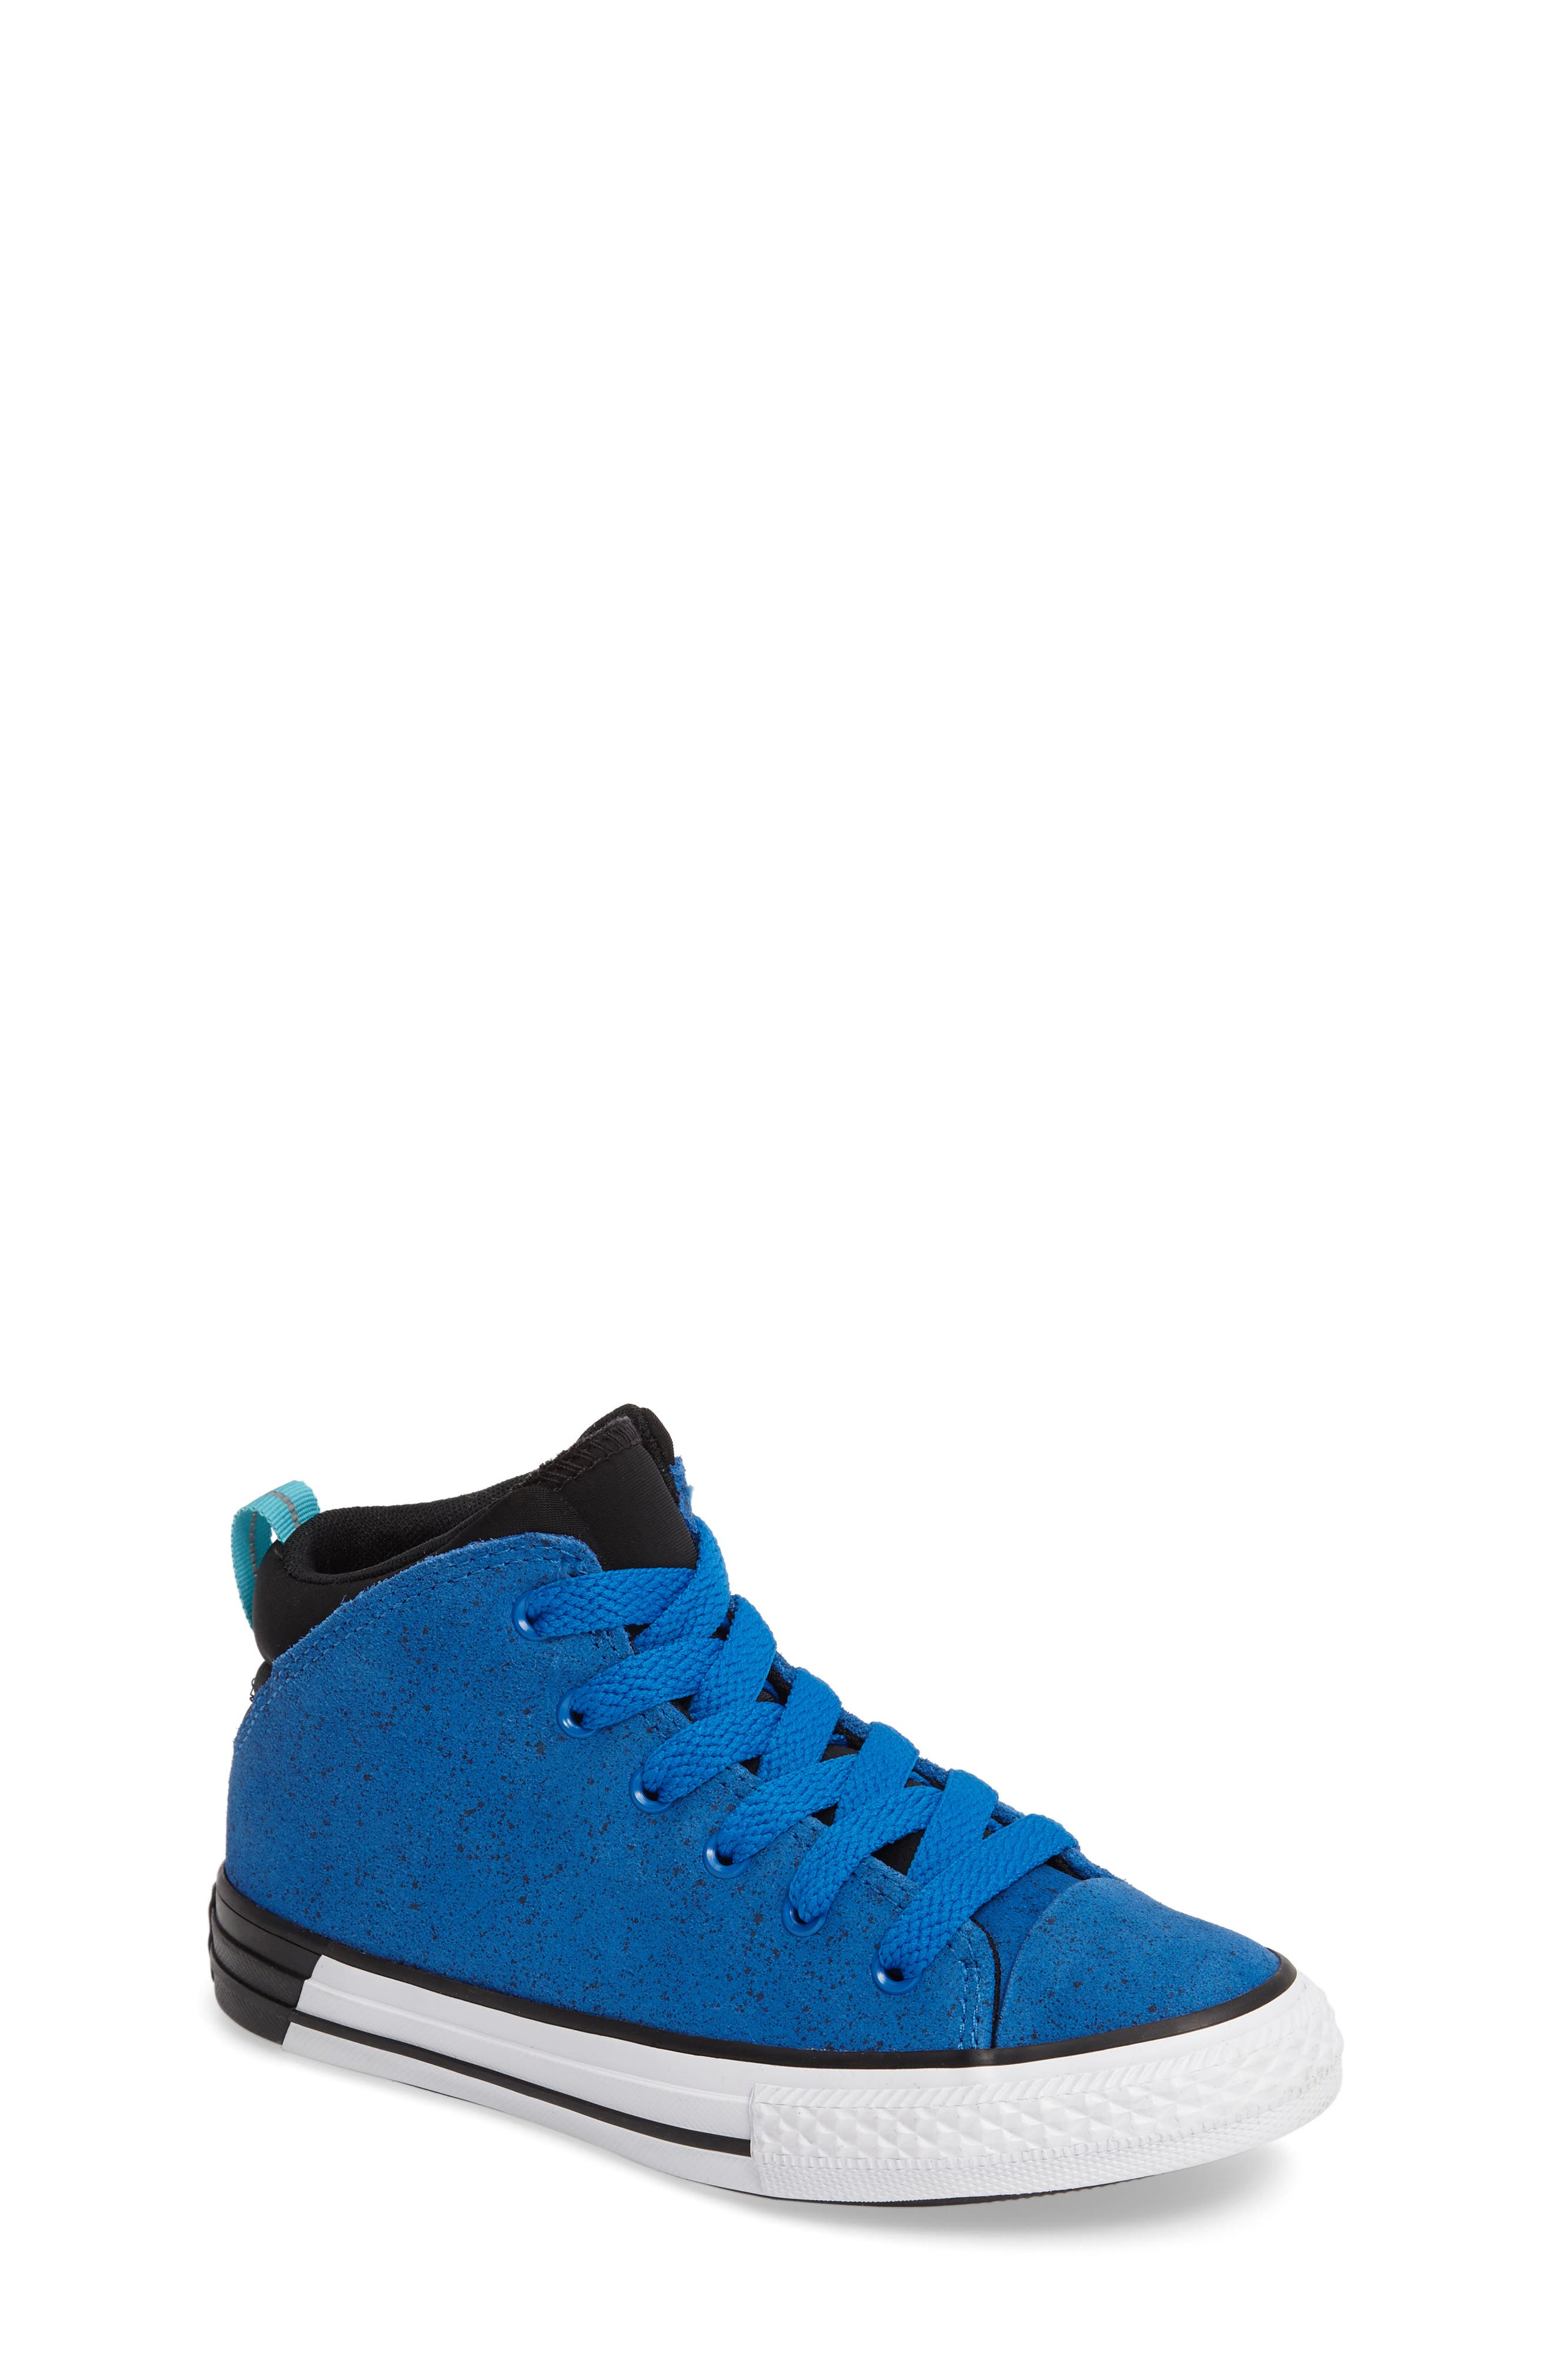 Converse Chuck Taylor® All Star® Sneaker (Toddler, Little Kid & Big Kid)